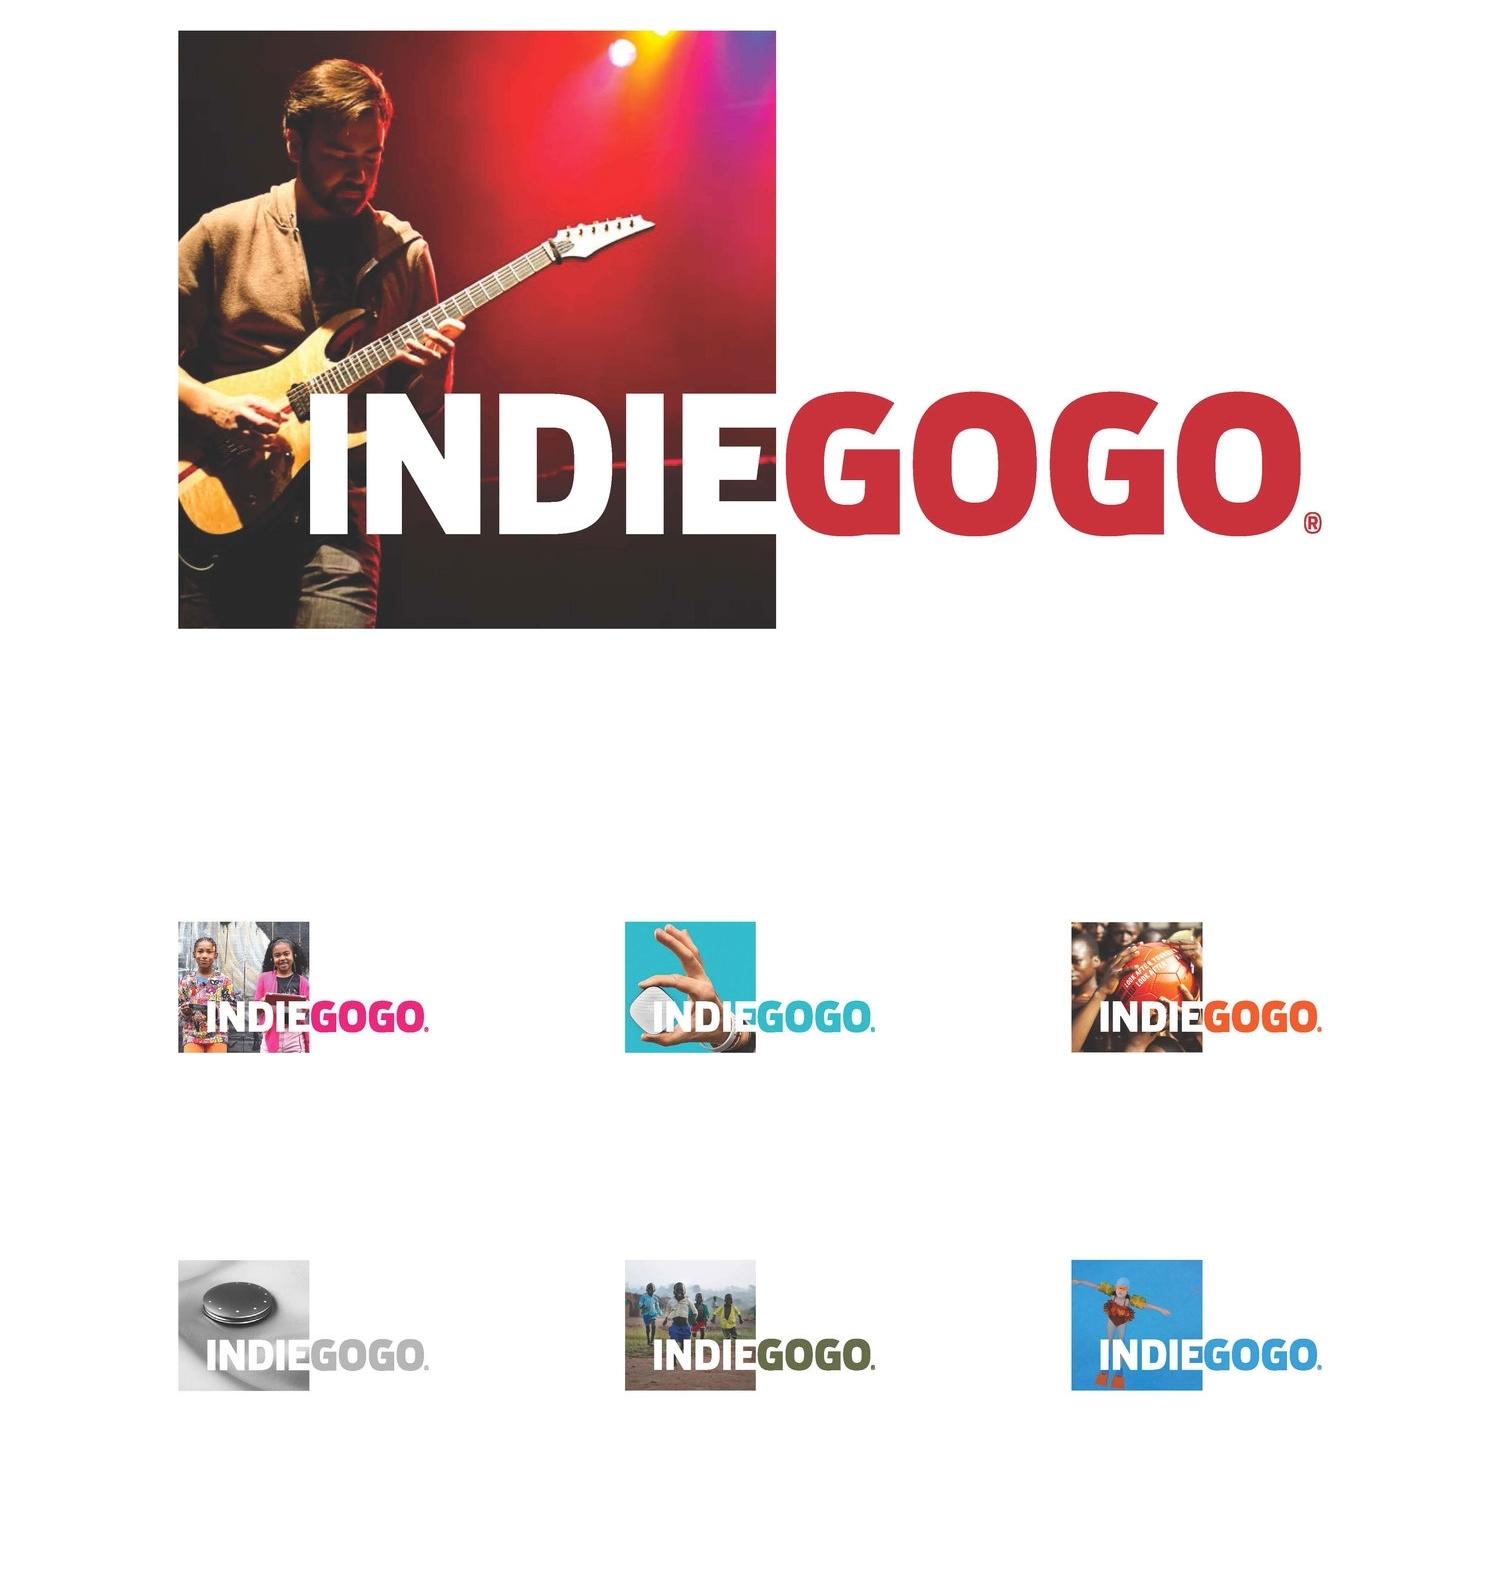 PUSH_Offices_Indiegogo_NewBrand.jpg